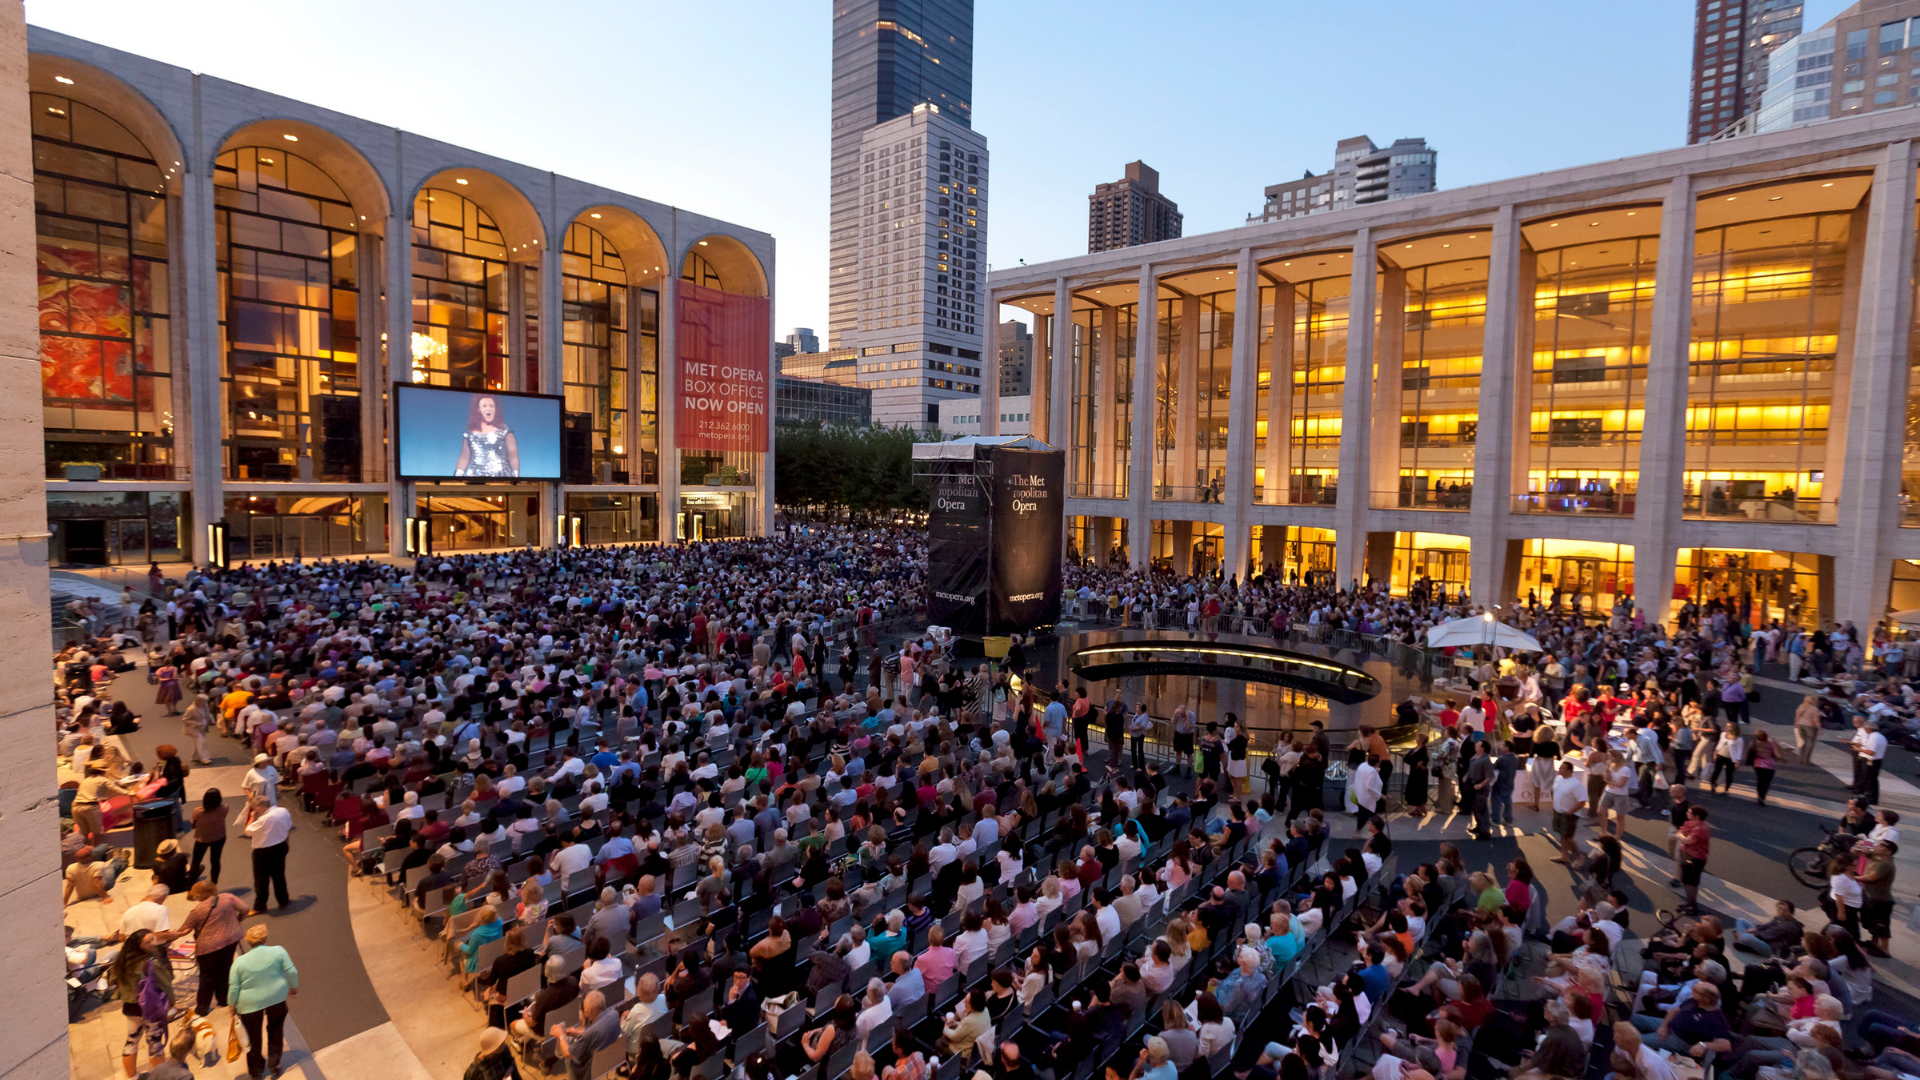 Richard Termine/Metropolitan Opera